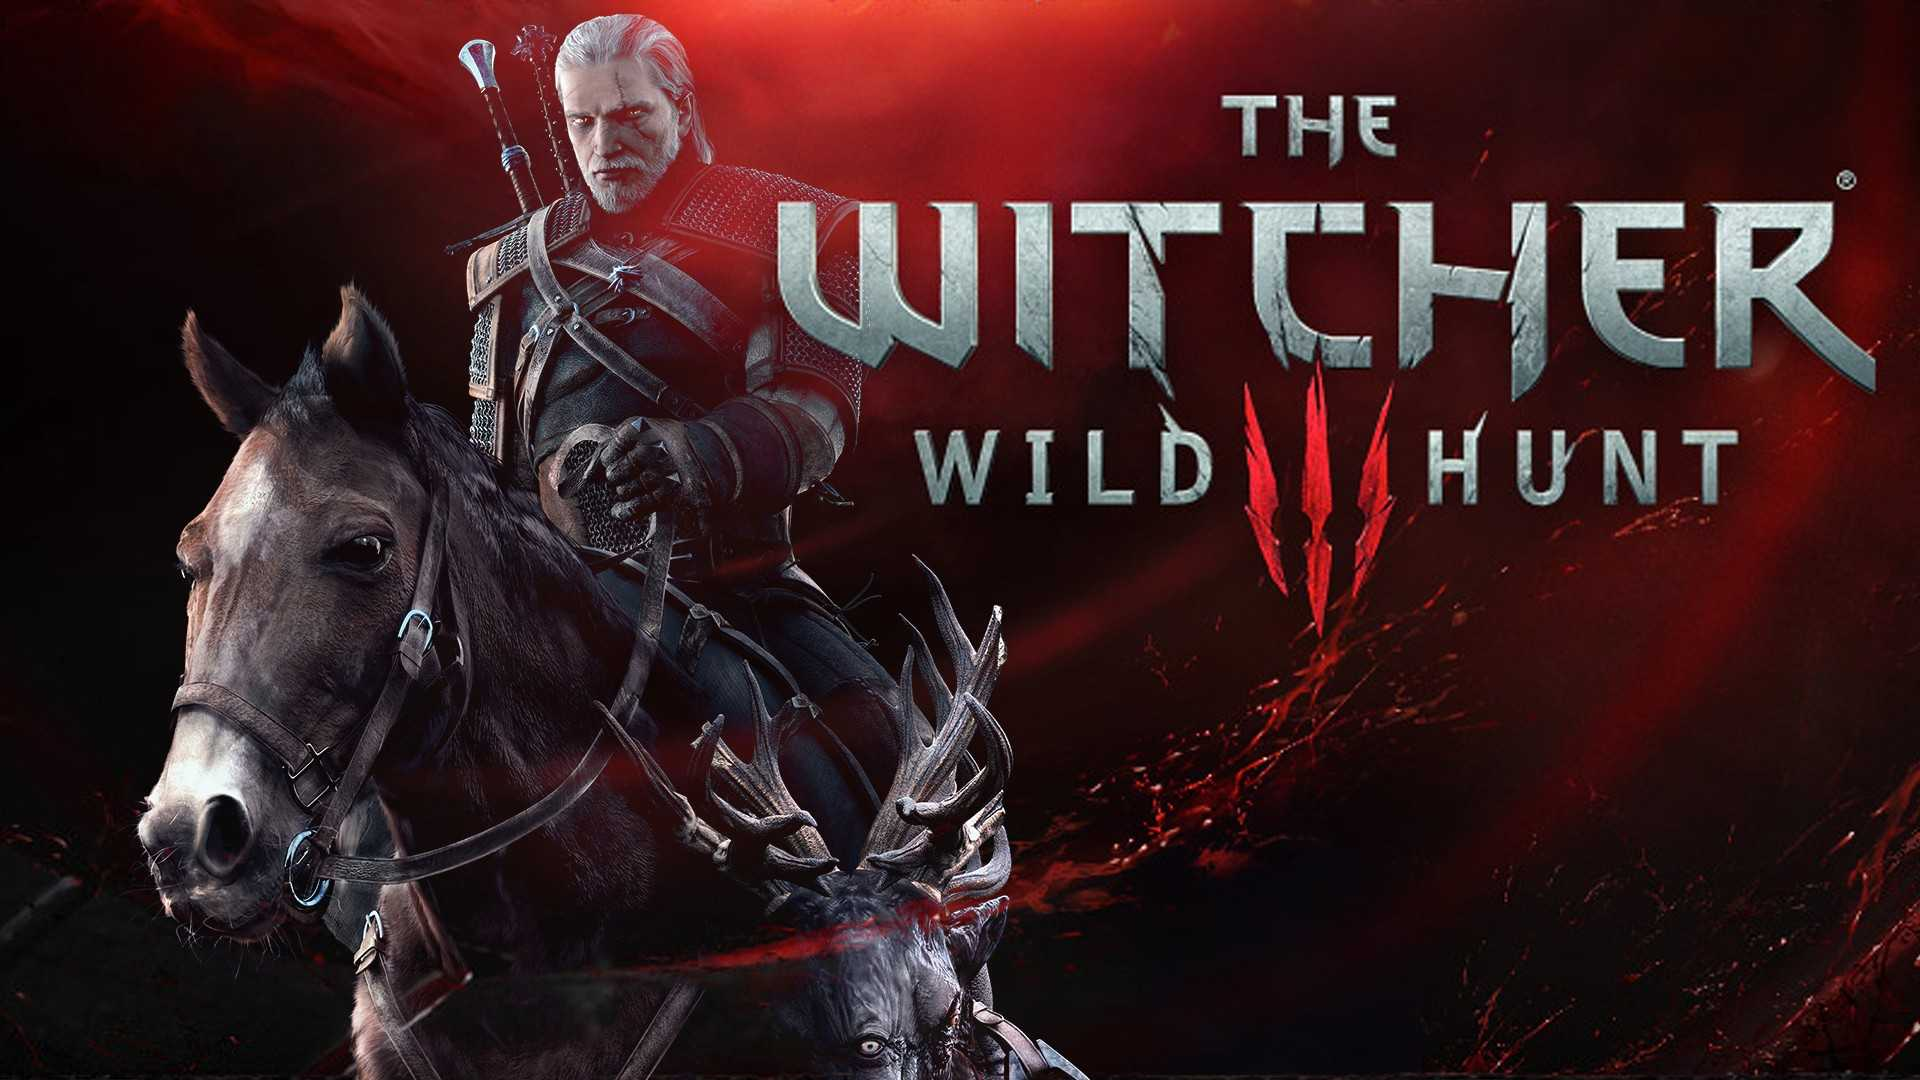 Как дешево купить The Witcher 3: Wild Hunt